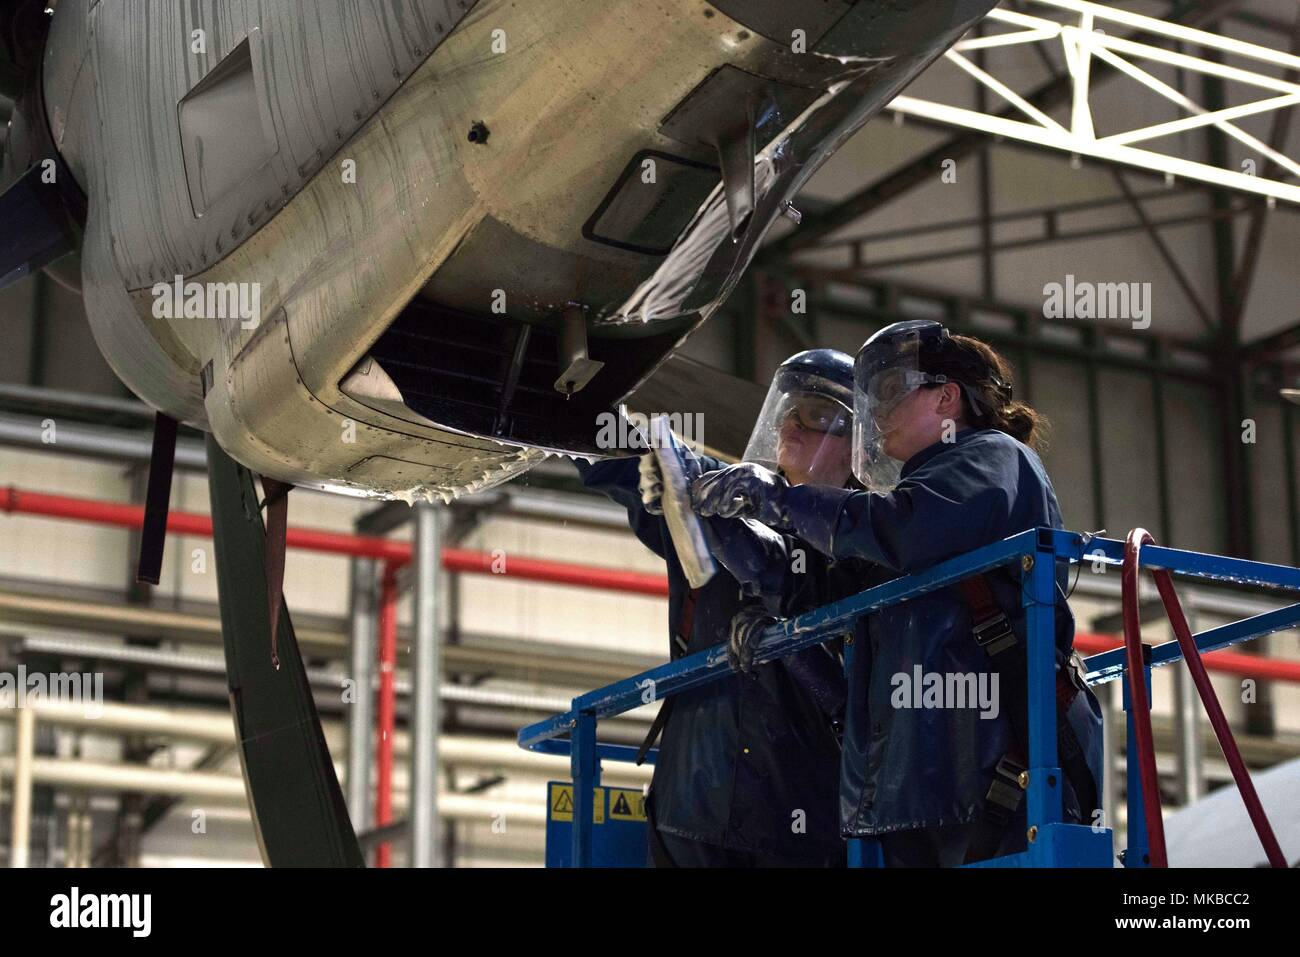 Super Spray Stock Photos Images Alamy Lili Air Us Force Senior Airman Rachel Revels Left And Staff